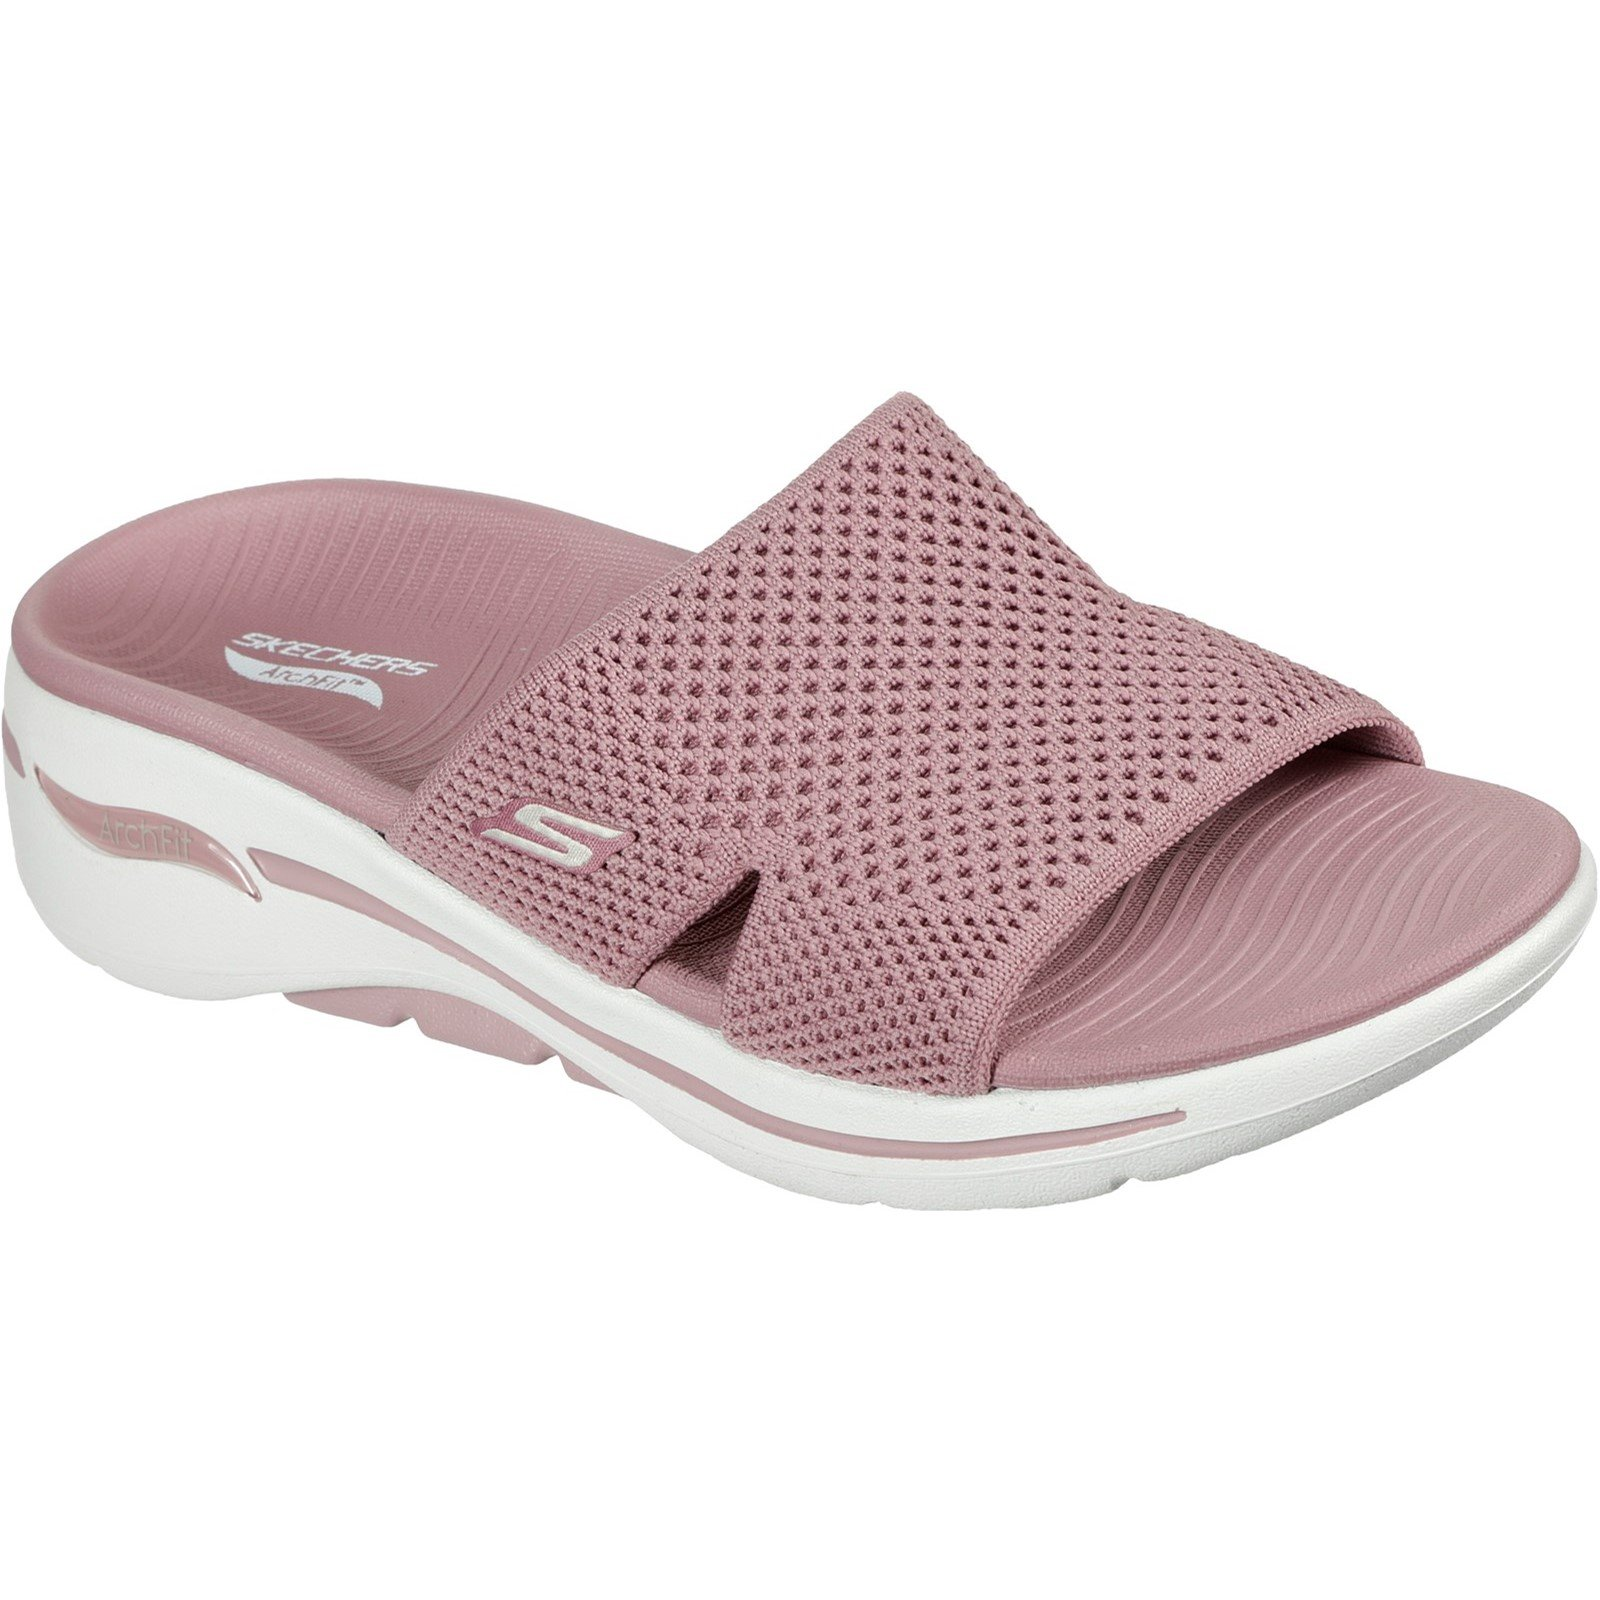 Skechers Women's Go Walk Arch Fit Worthy Summer Sandal Various Colours 32152 - Rose 3